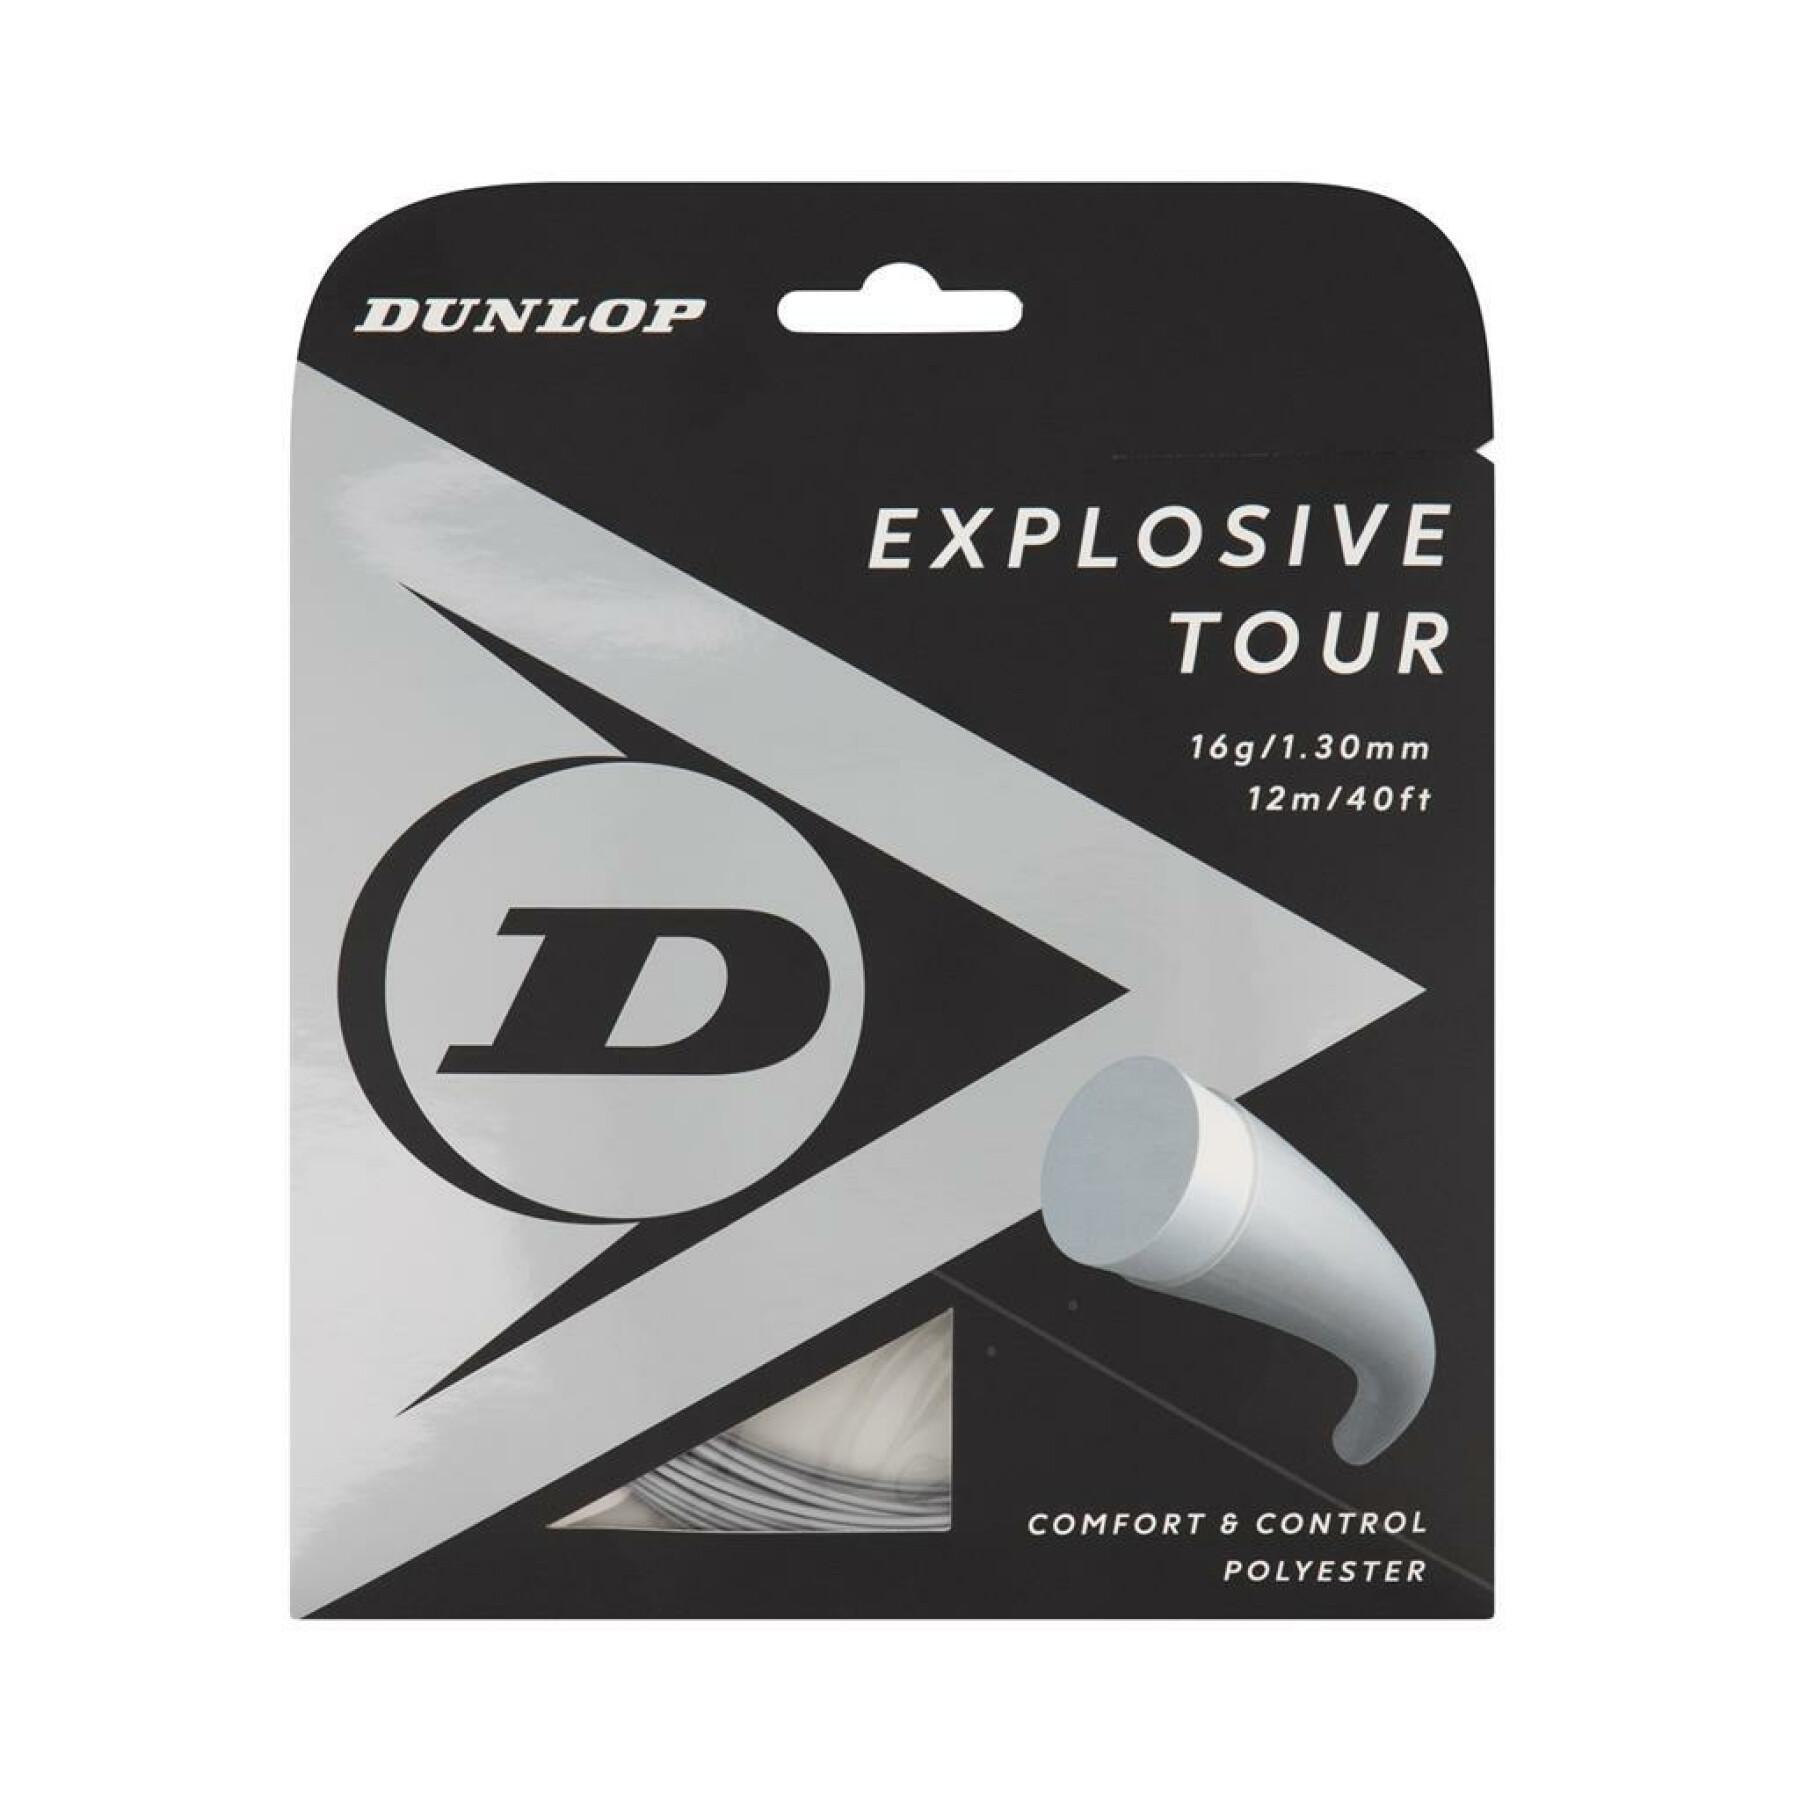 Rope Dunlop explosive tour